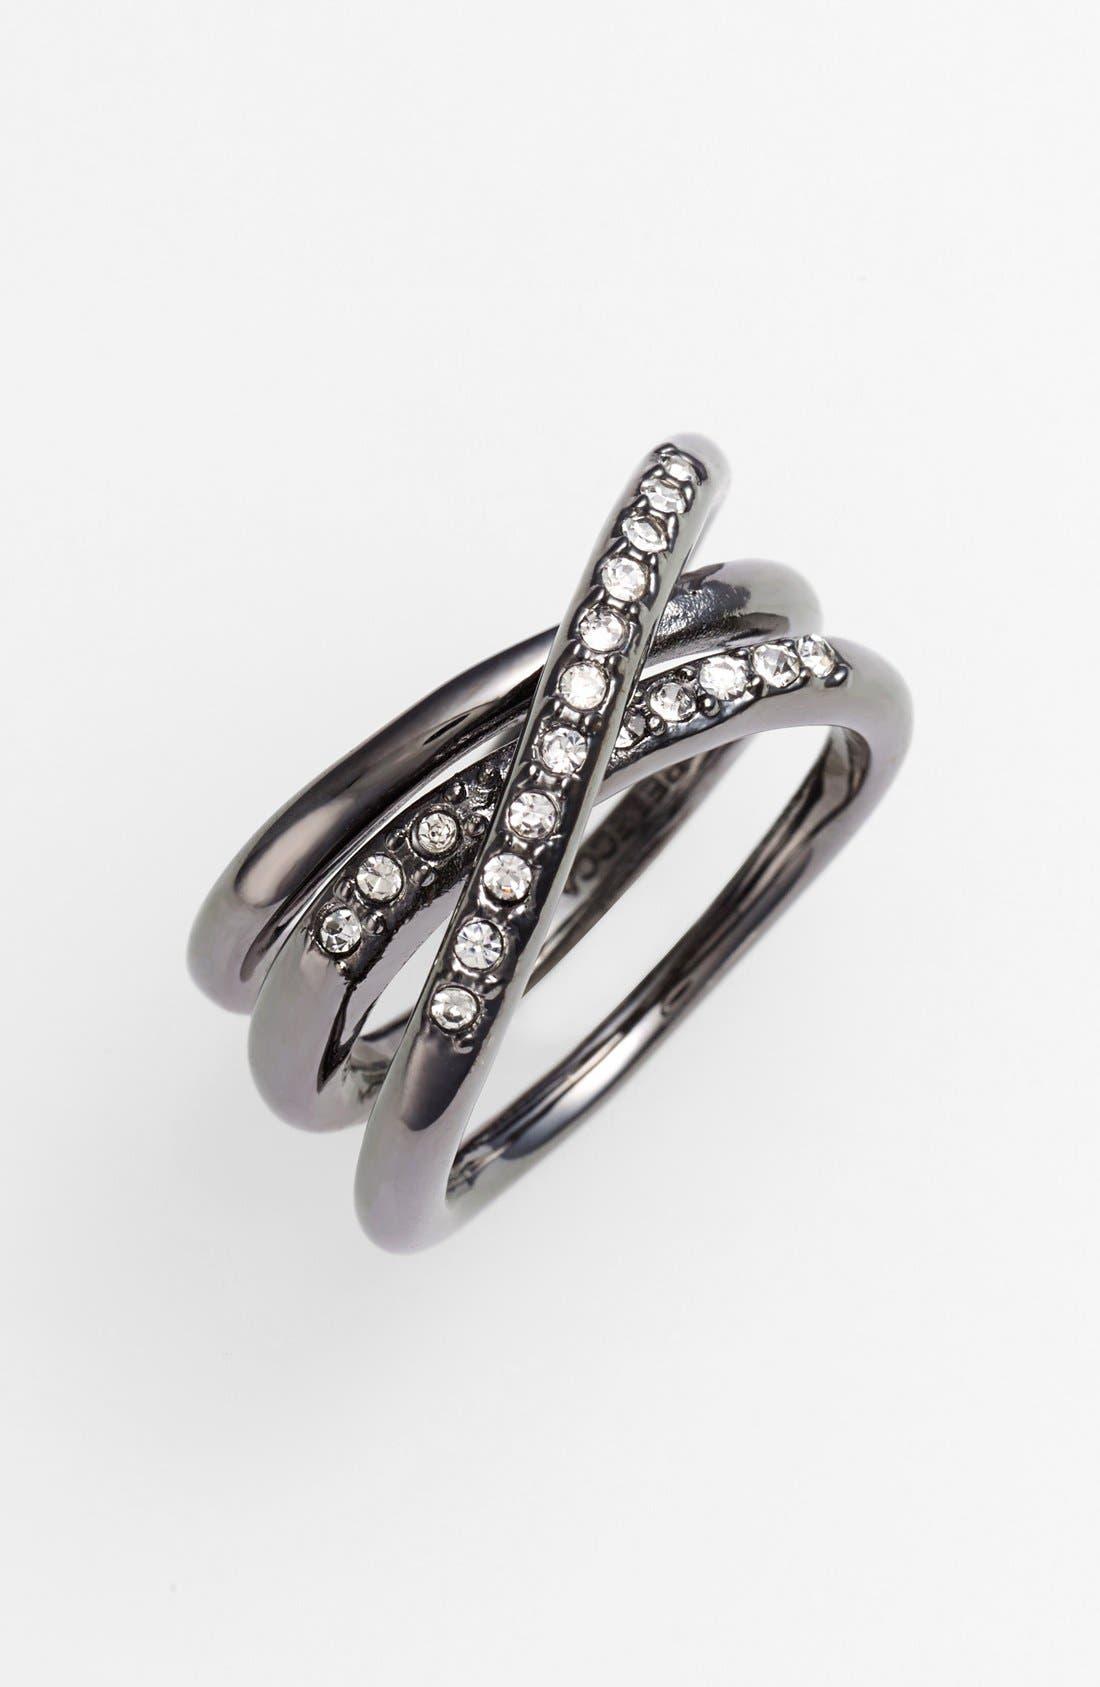 Main Image - Rebecca Minkoff 'Jewel Box' Pavé Coil Ring